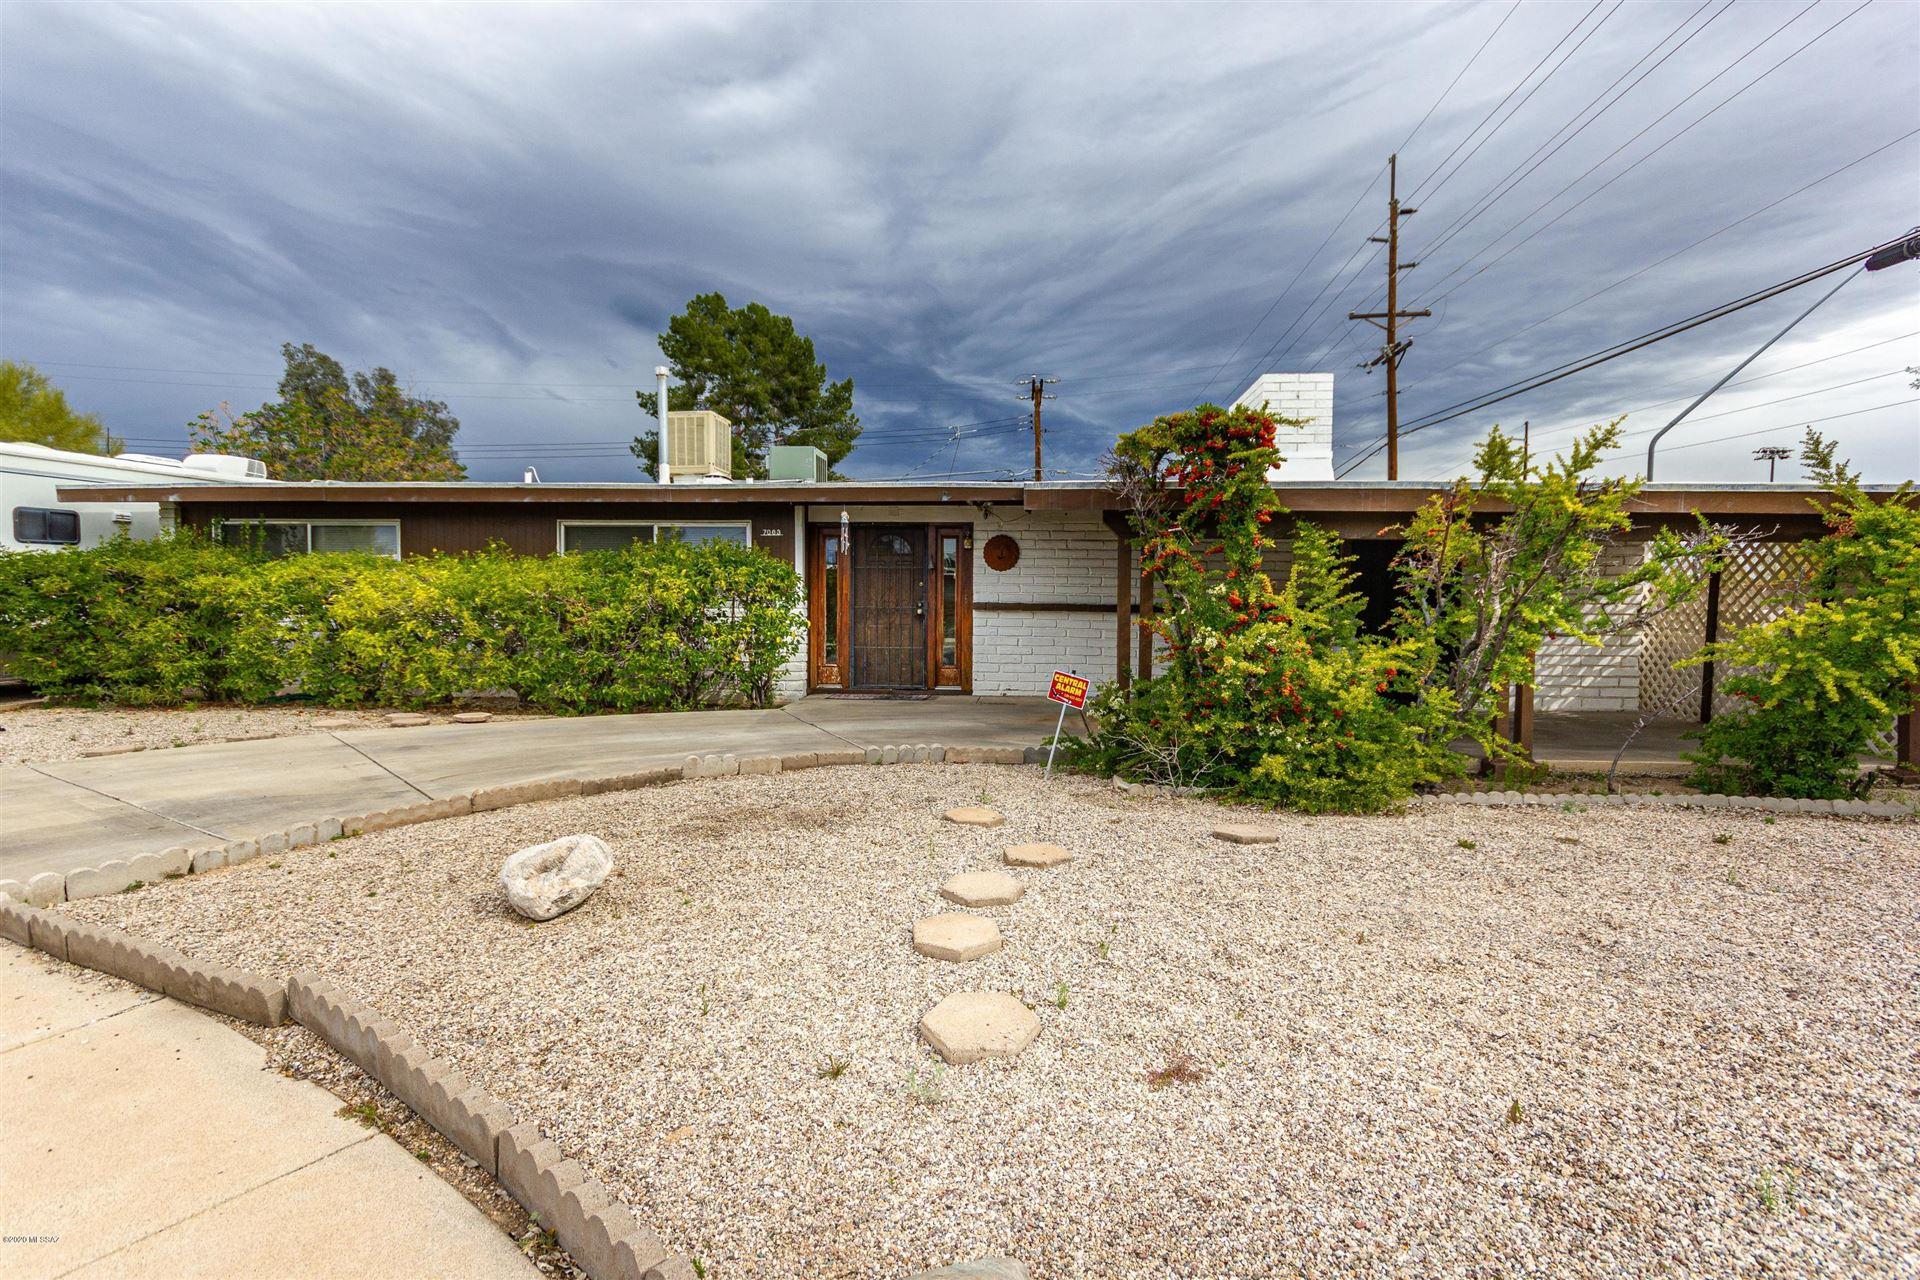 7063 E Malvern Place, Tucson, AZ 85710 - MLS#: 22008550